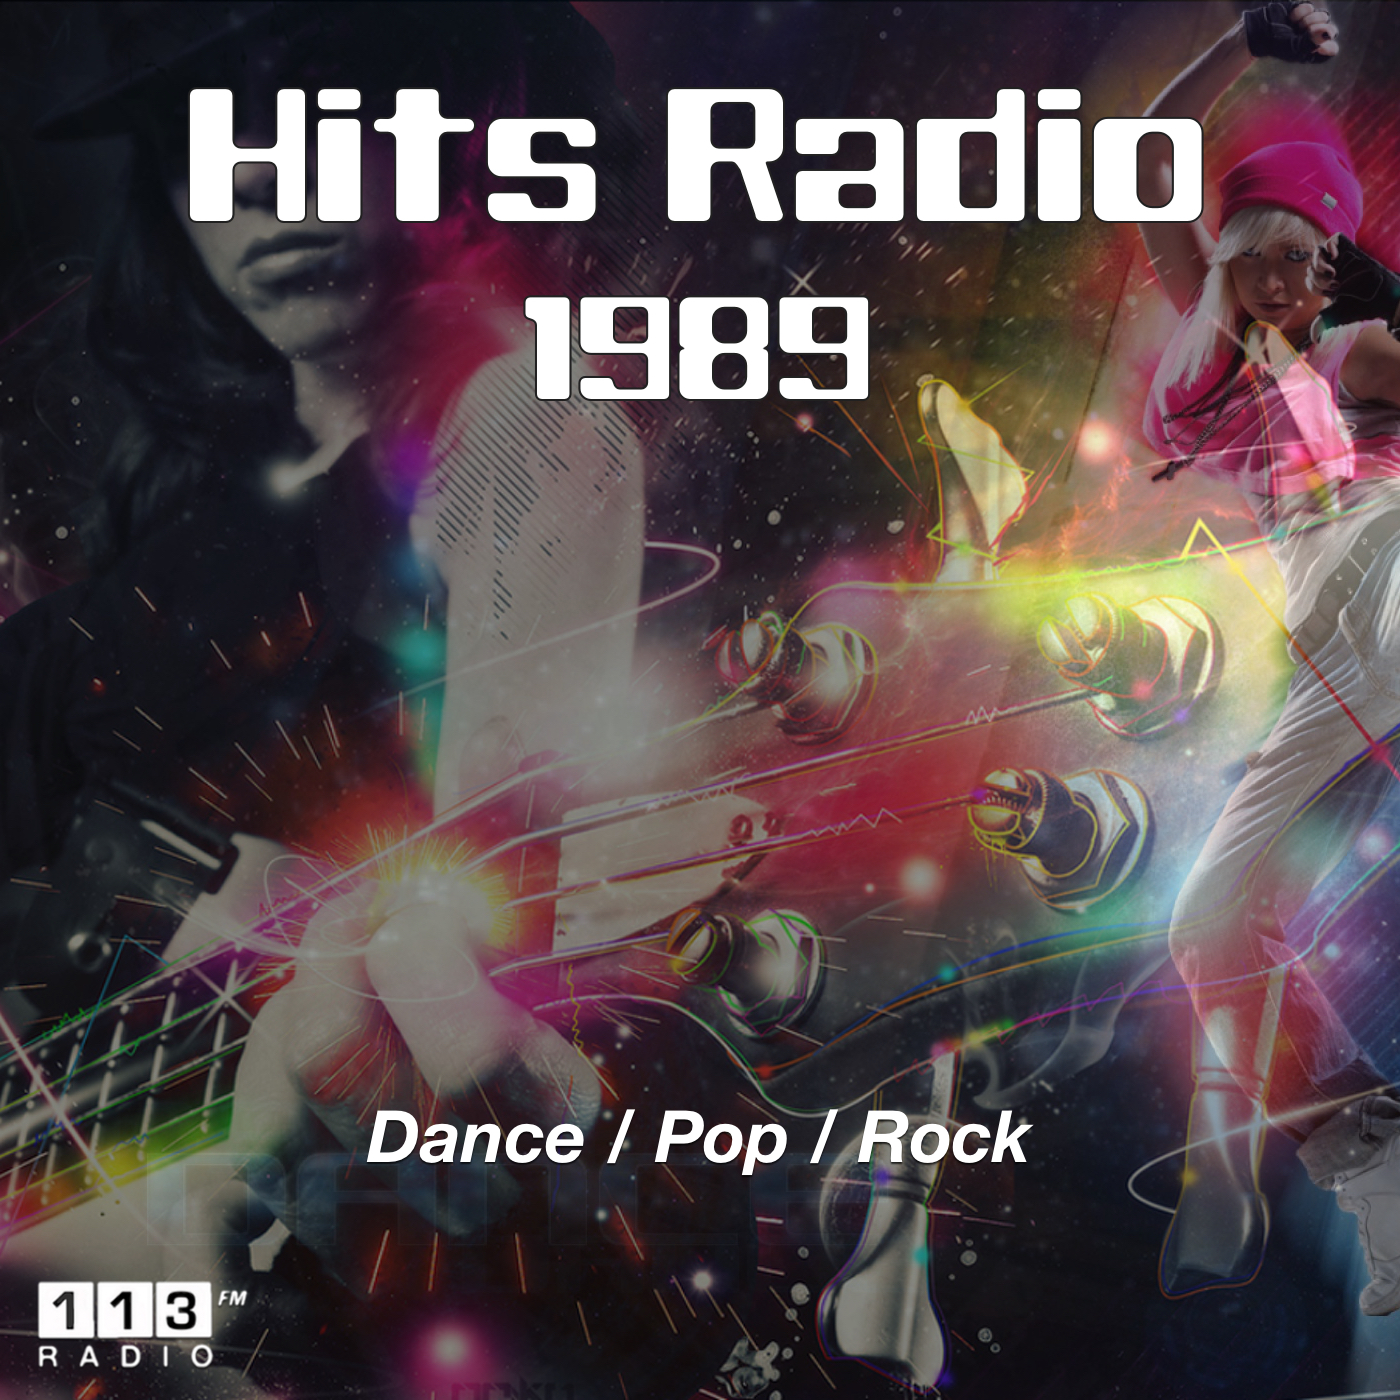 113.fm Hits Radio - 1989